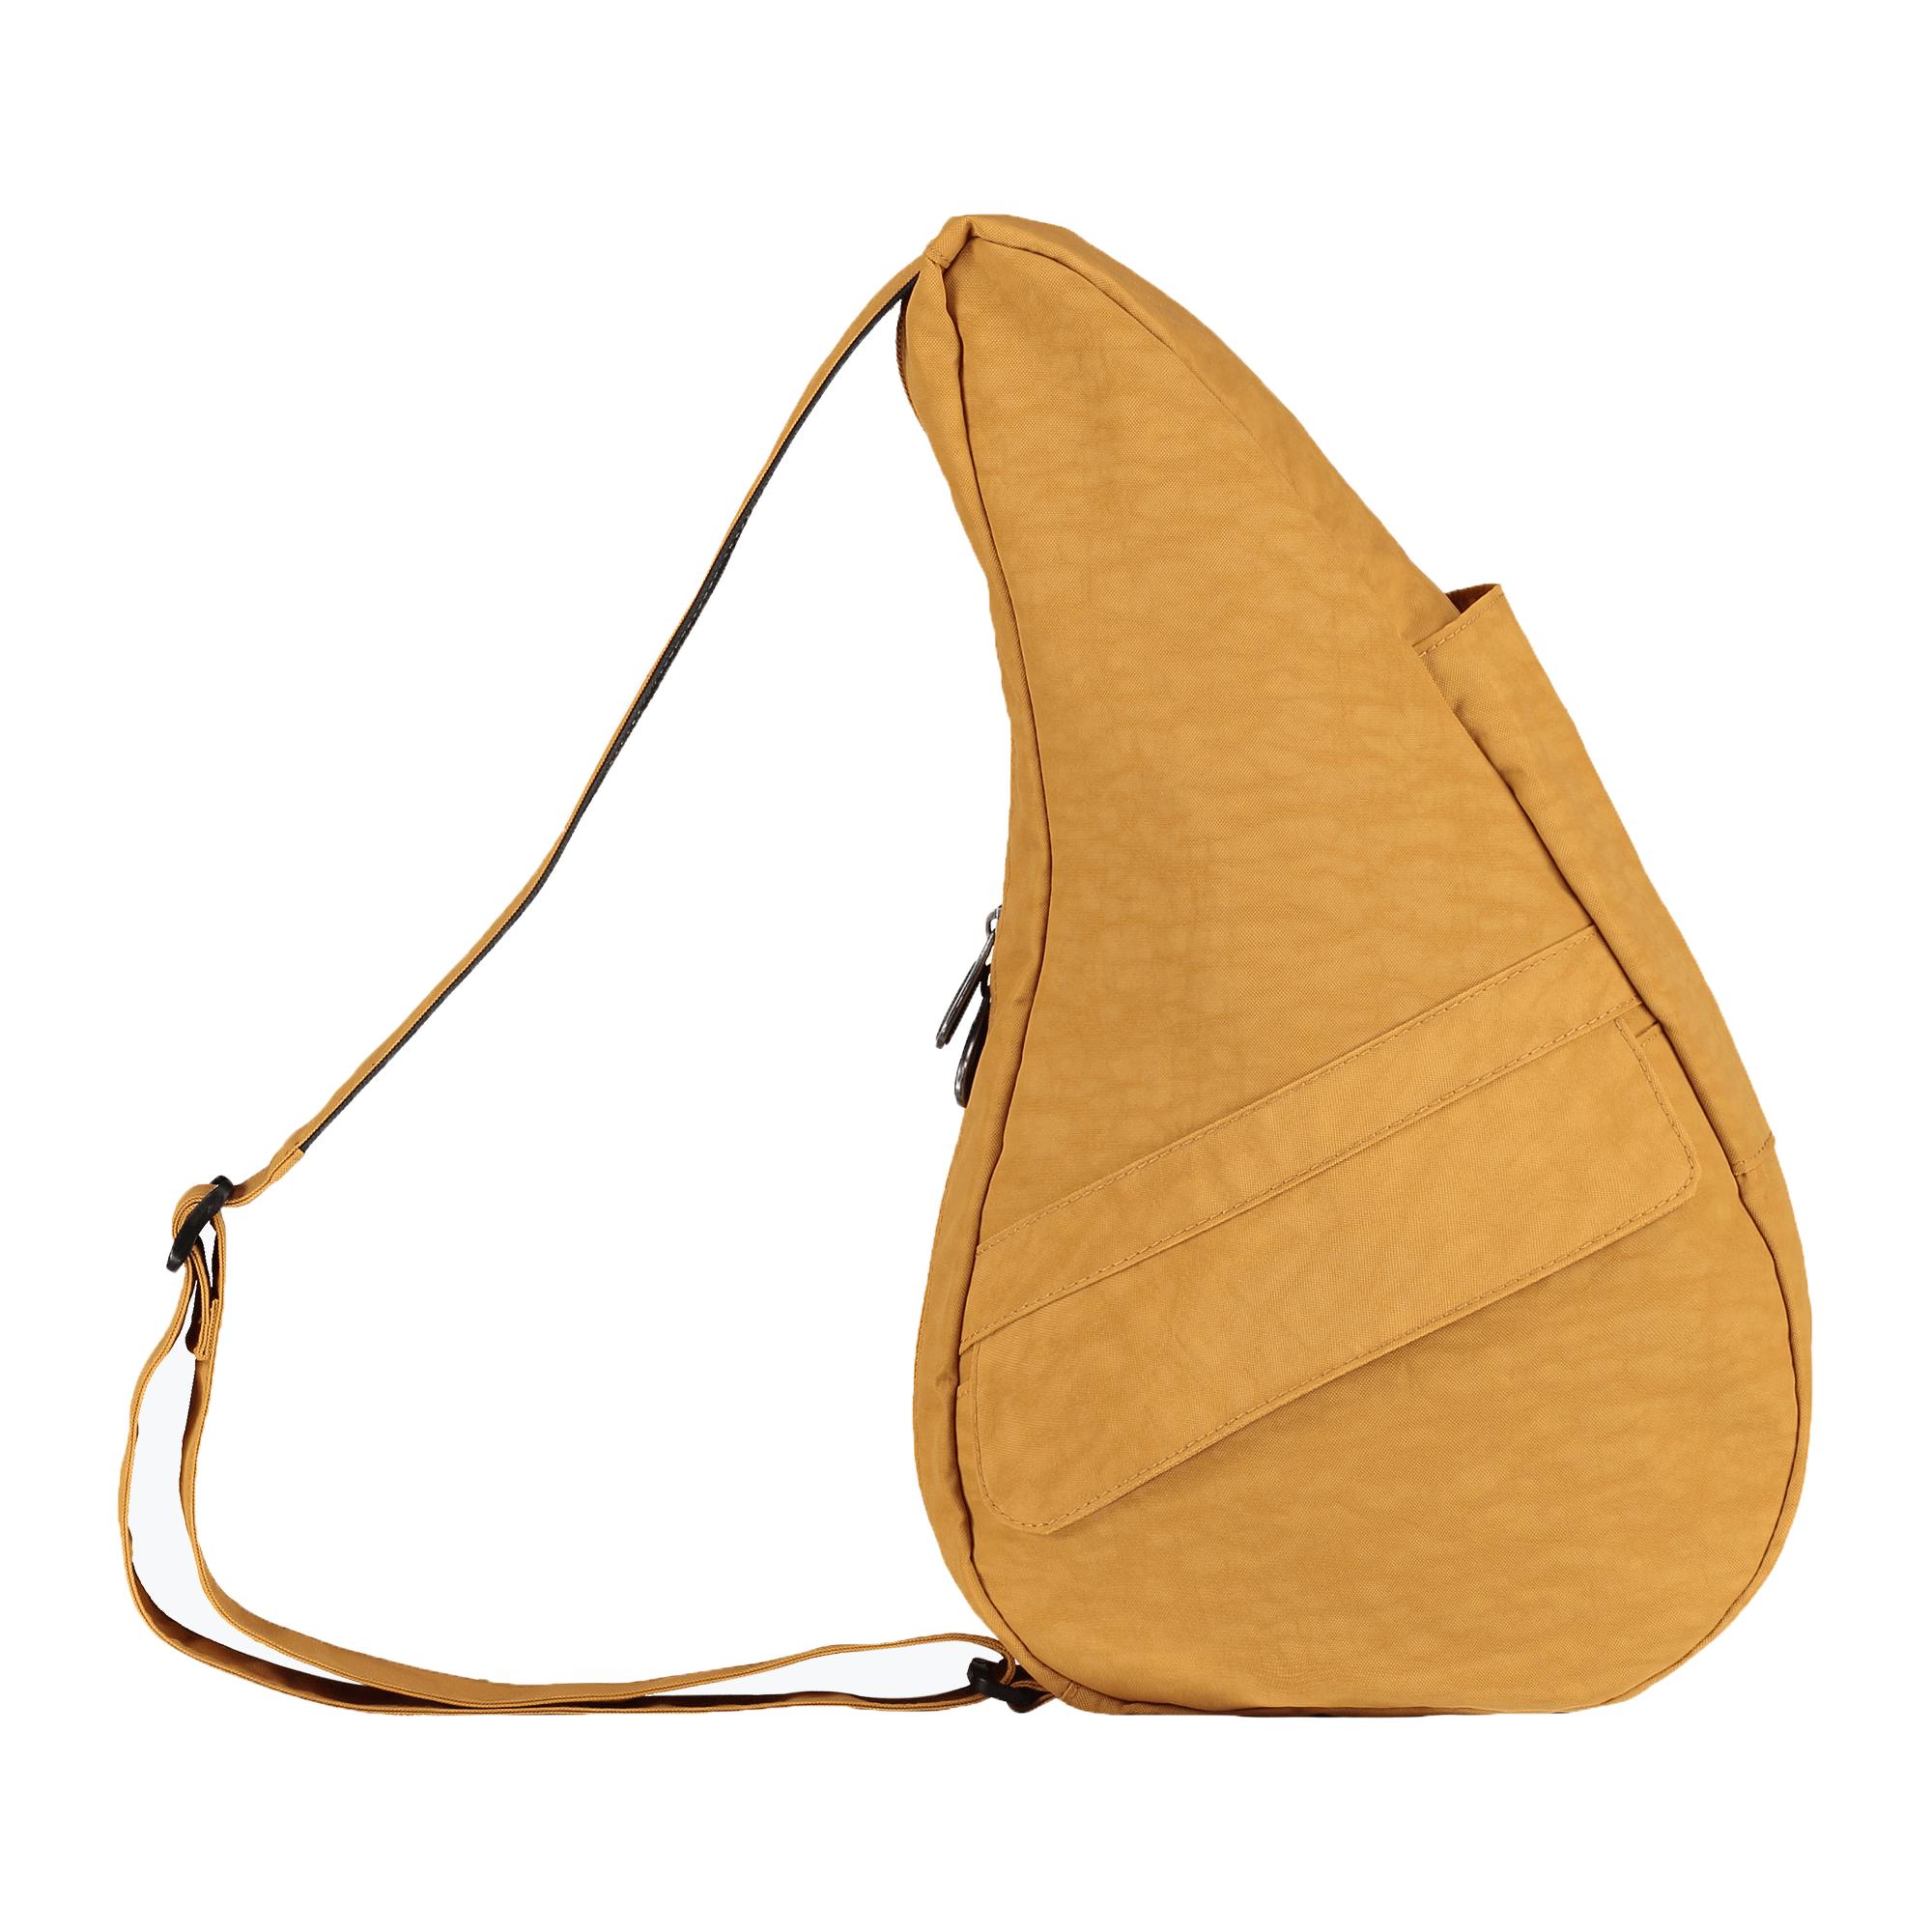 Healthy Inca Back Bag Textured Gold Nylon S xCWdoerBQ